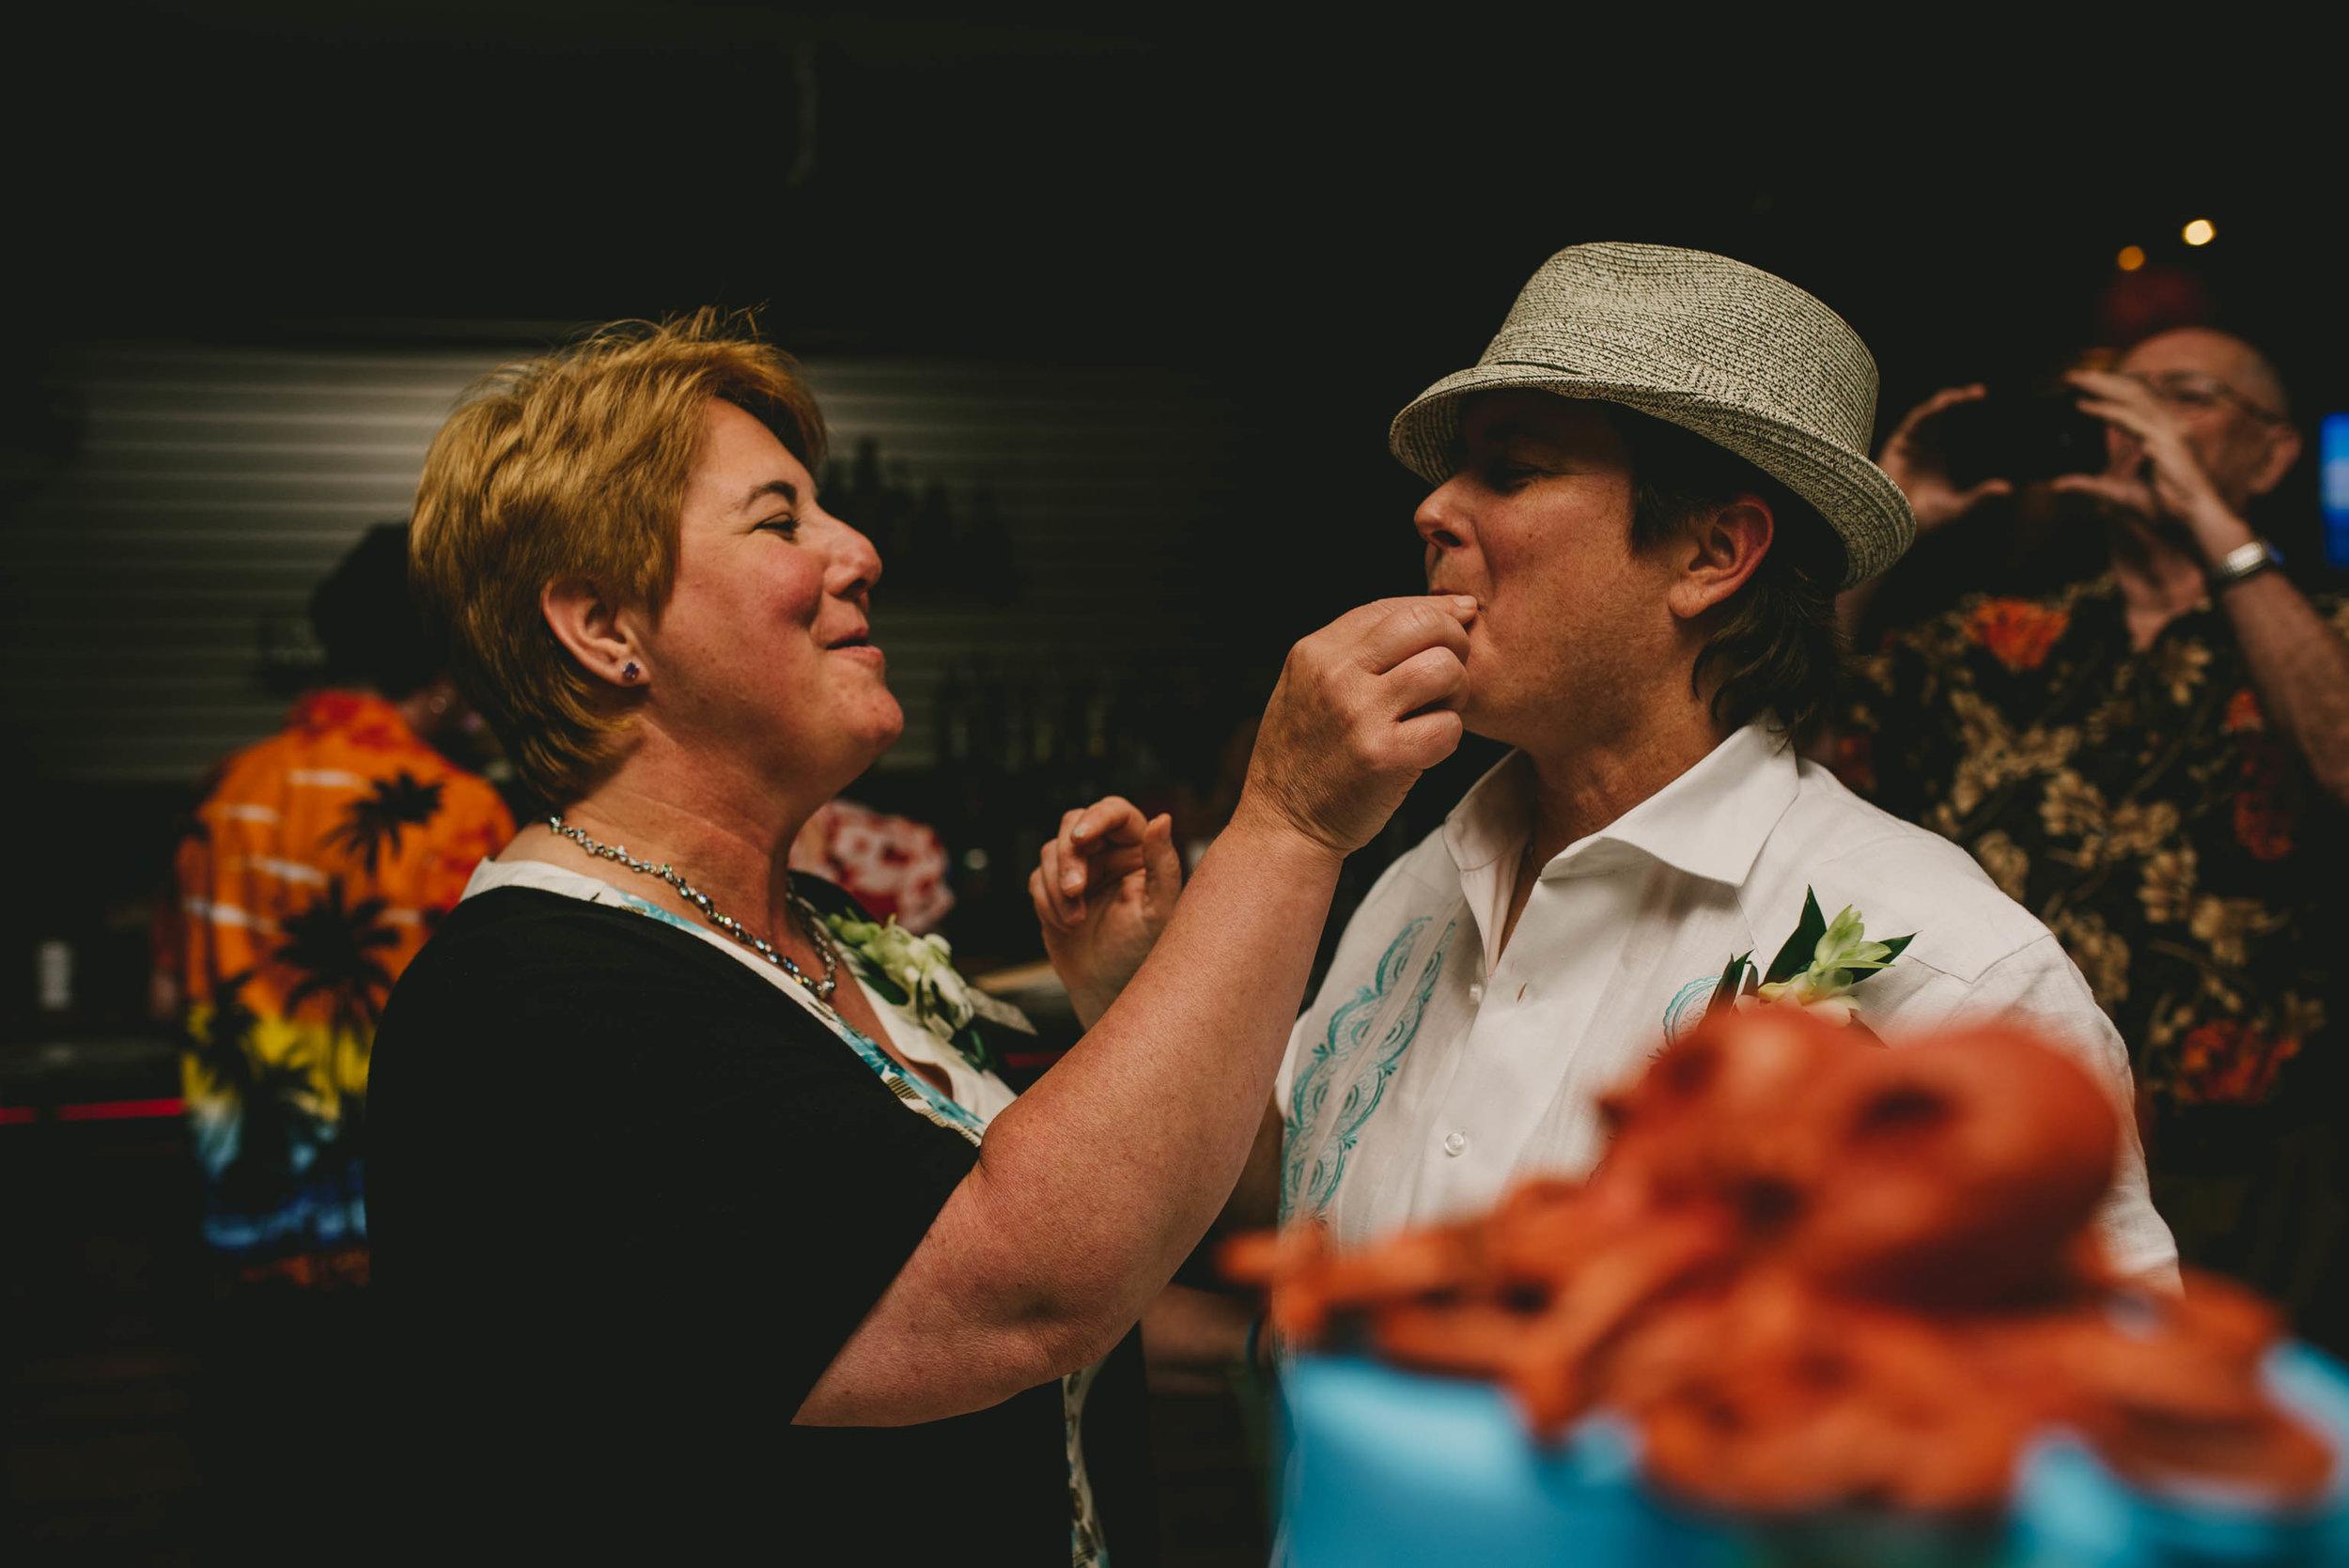 solas-restaurant-raleigh-same-sex-wedding-cake-cutting-photos.jpg